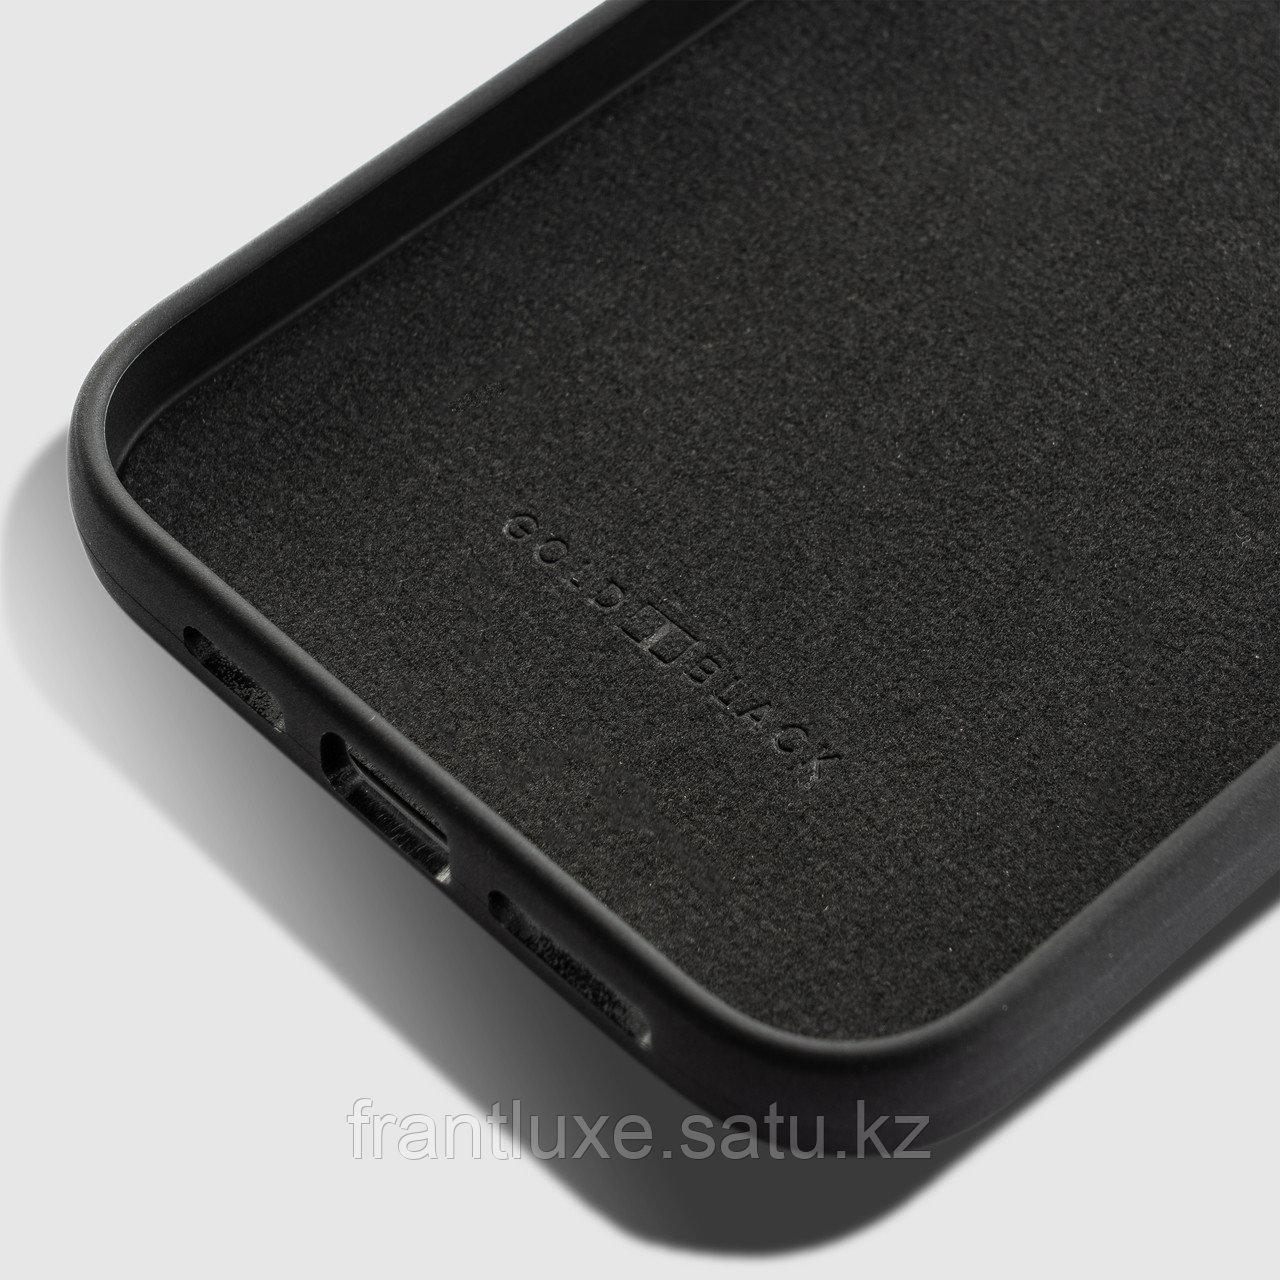 Чехол для телефона iPhone 12 Pro Max синий - фото 2